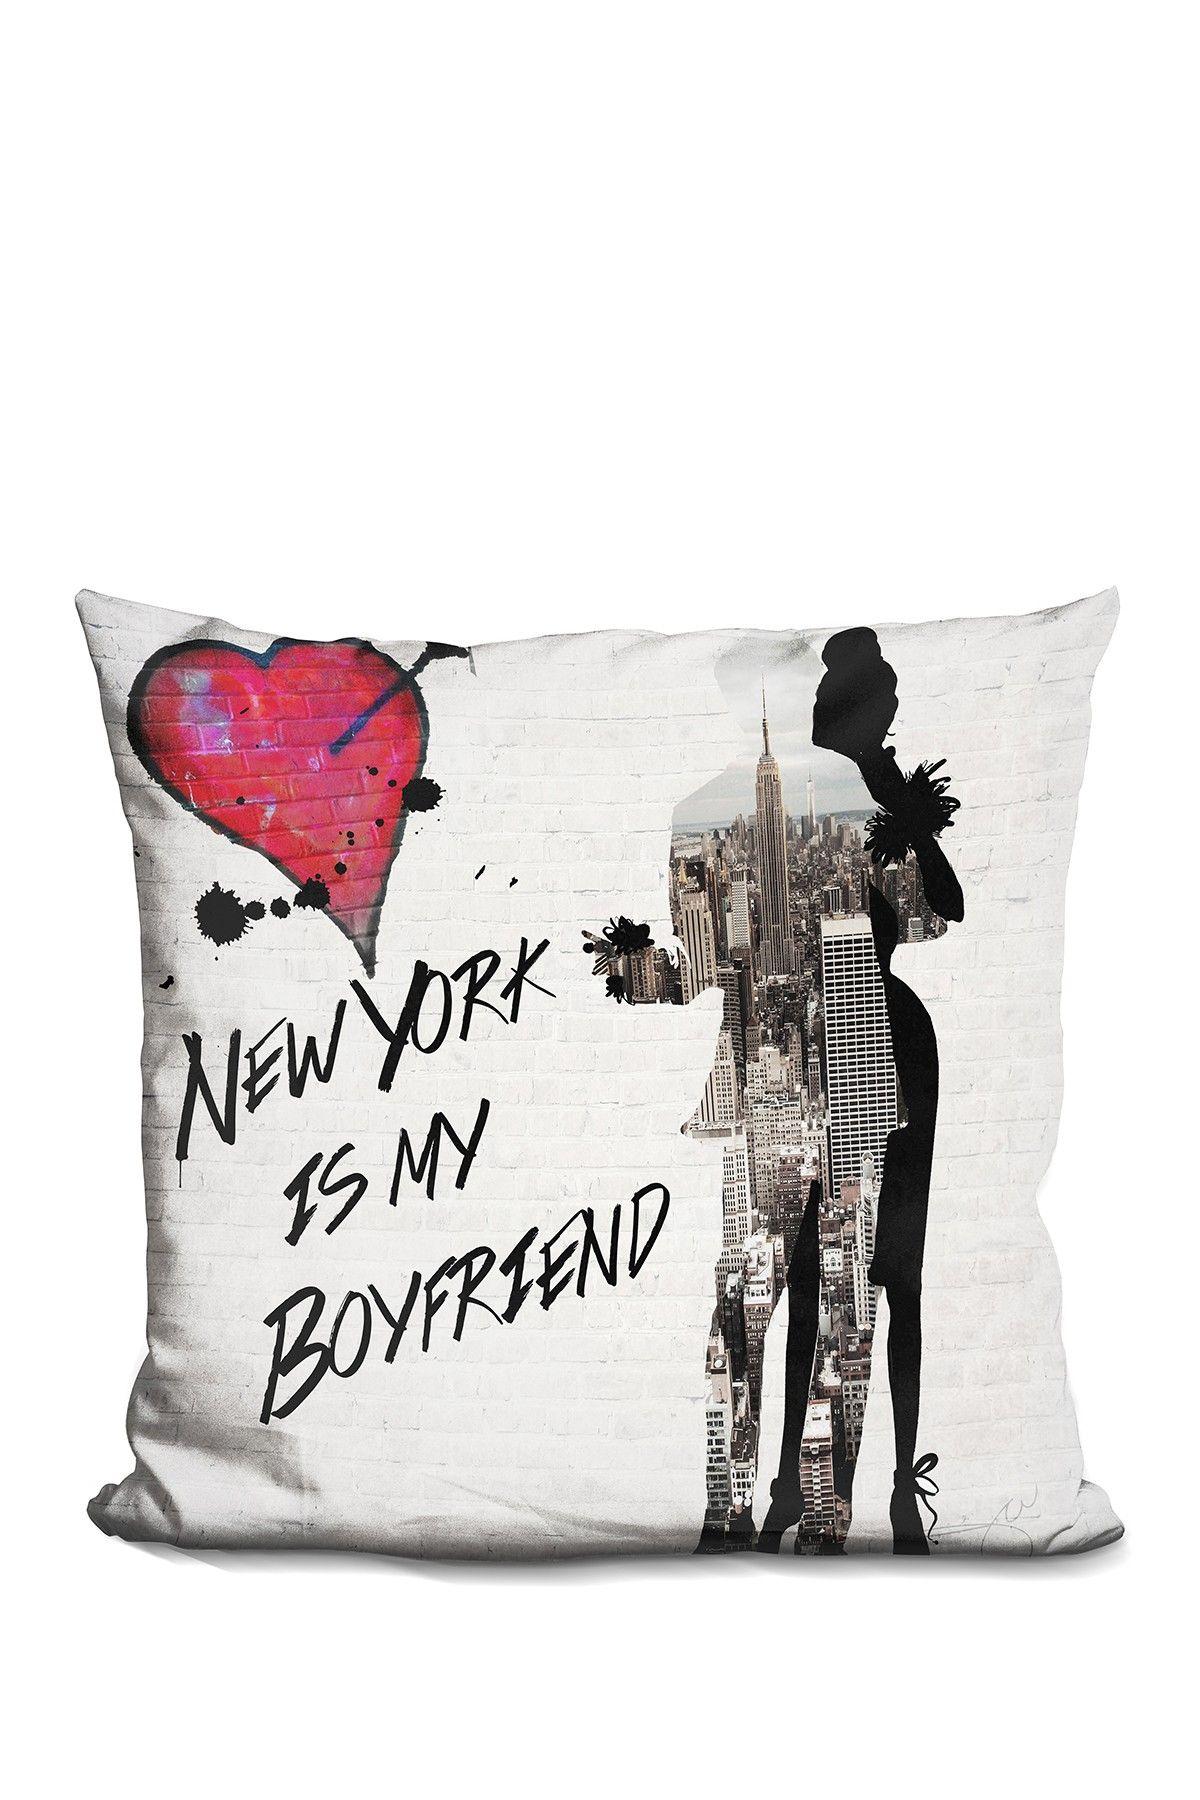 Lilipi brand new york is my boyfriend pillow home office